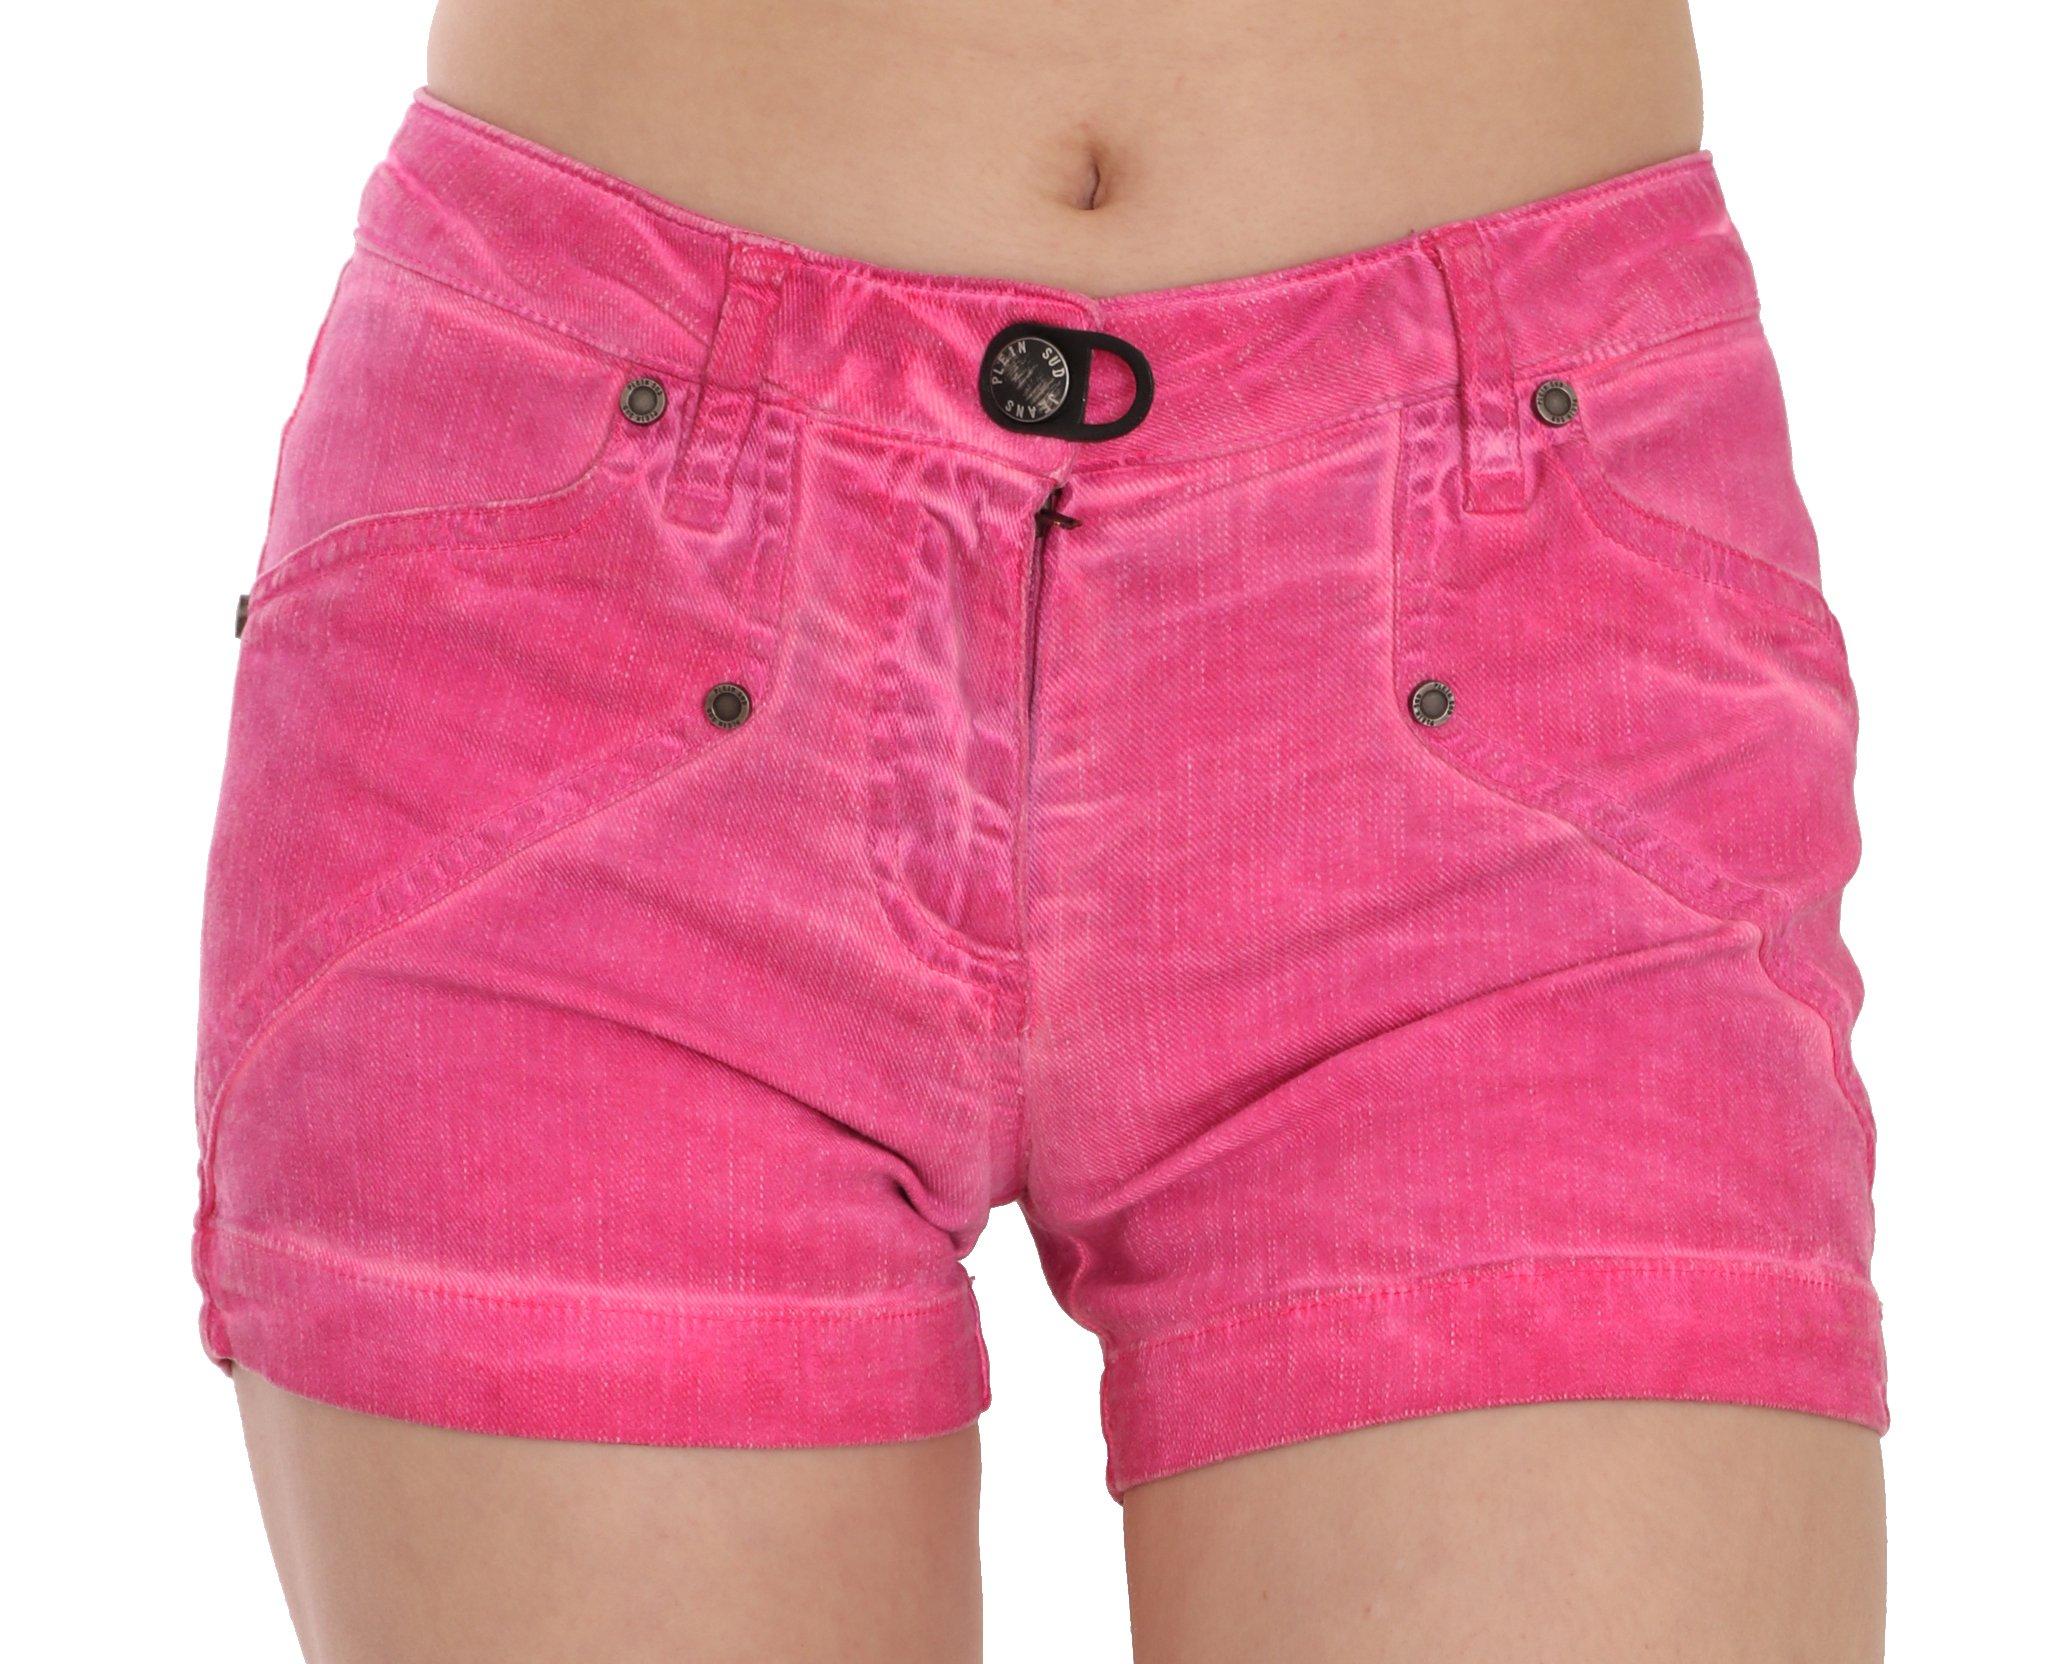 PLEIN SUD Women's Mid Waist Cotton Denim Mini Shorts Pink PAN70247 - IT36 | XS